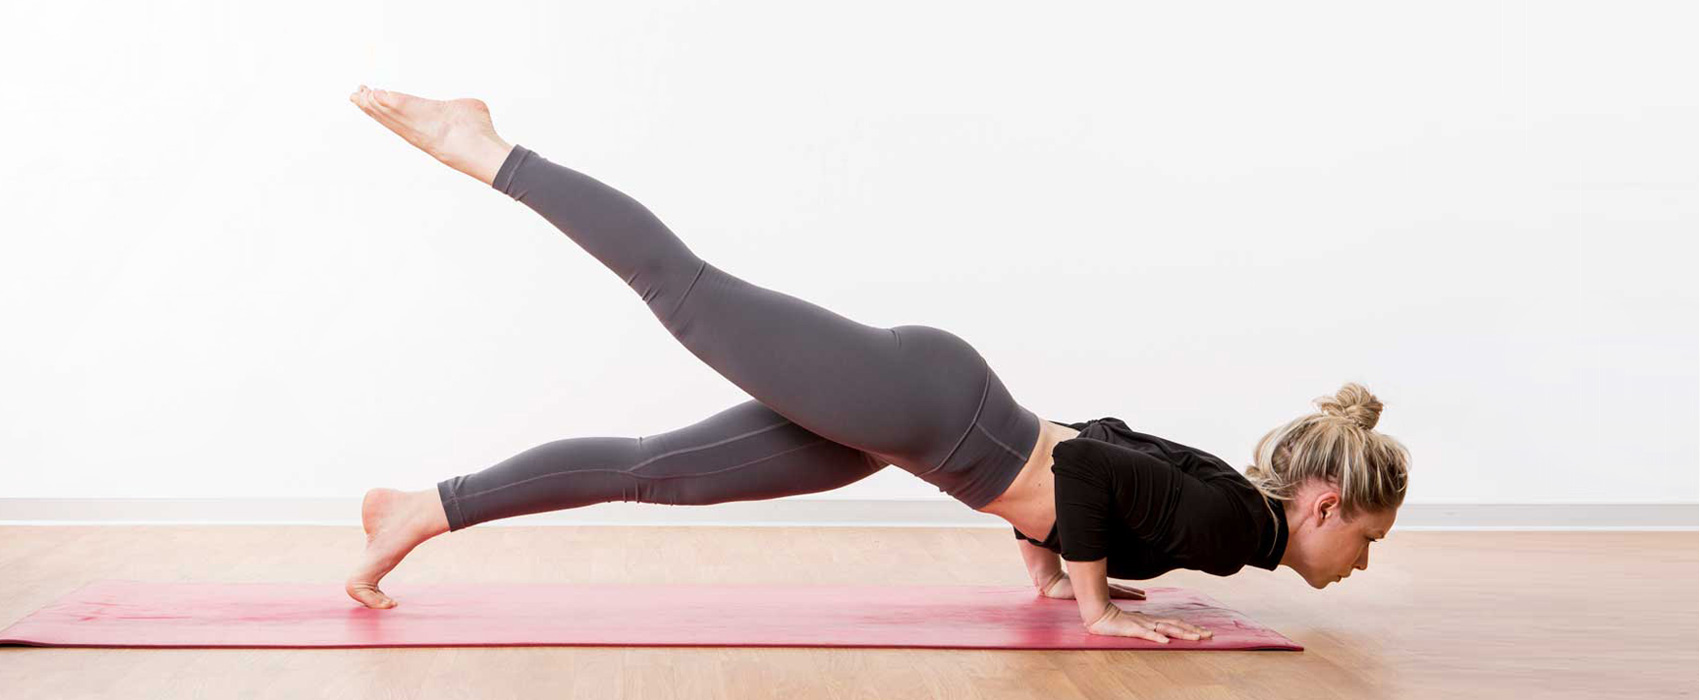 O.MY.YOGA Ulm, Anna Altrichter Yoga Lehrerin Ashtanga/Hatha und RYT500h aus Ulm. Yoga Kurse für Asthanga, Vinyasa und Hatha. Yoga Kurse für Firmen, Kooperationen mit Firmen.